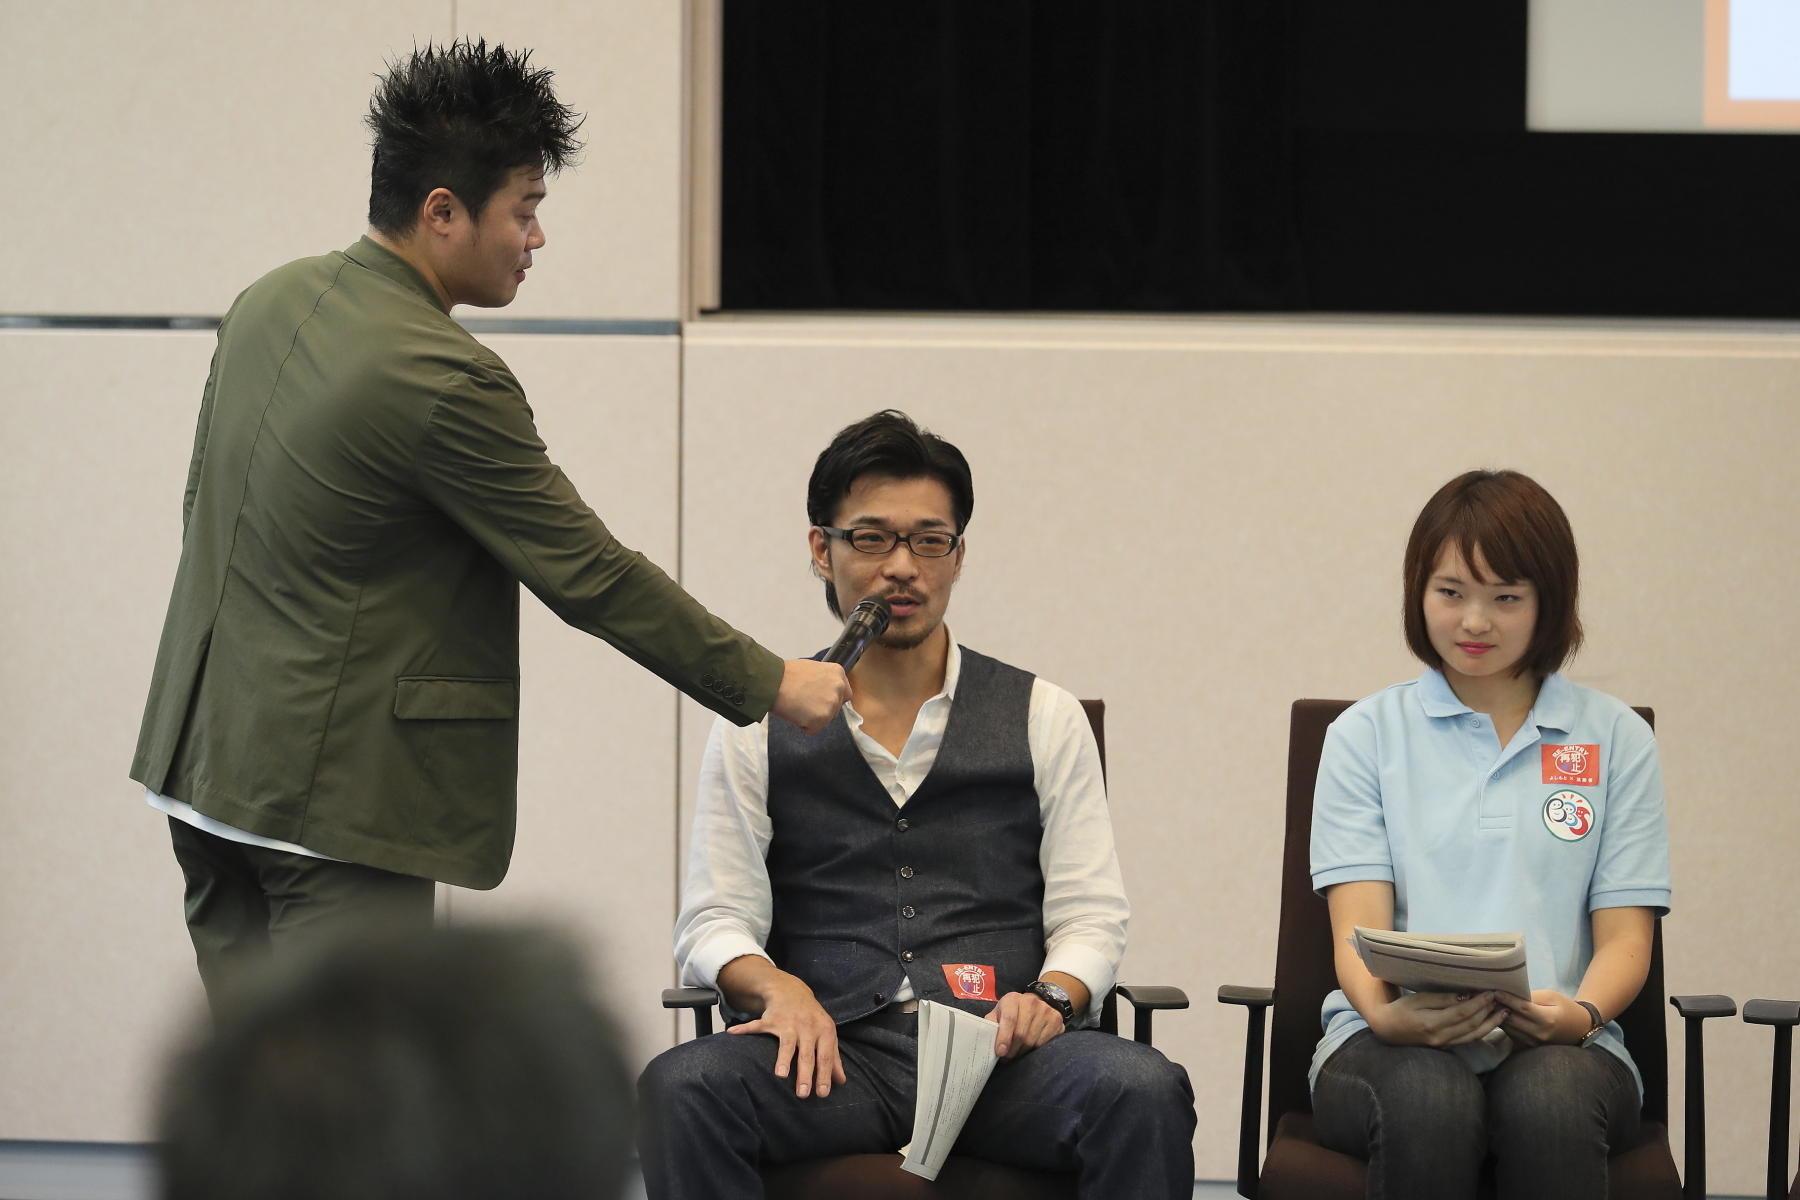 http://news.yoshimoto.co.jp/20181006204328-554461931167ff38d3d7e68e99ce81b4d7efe5e8.jpg